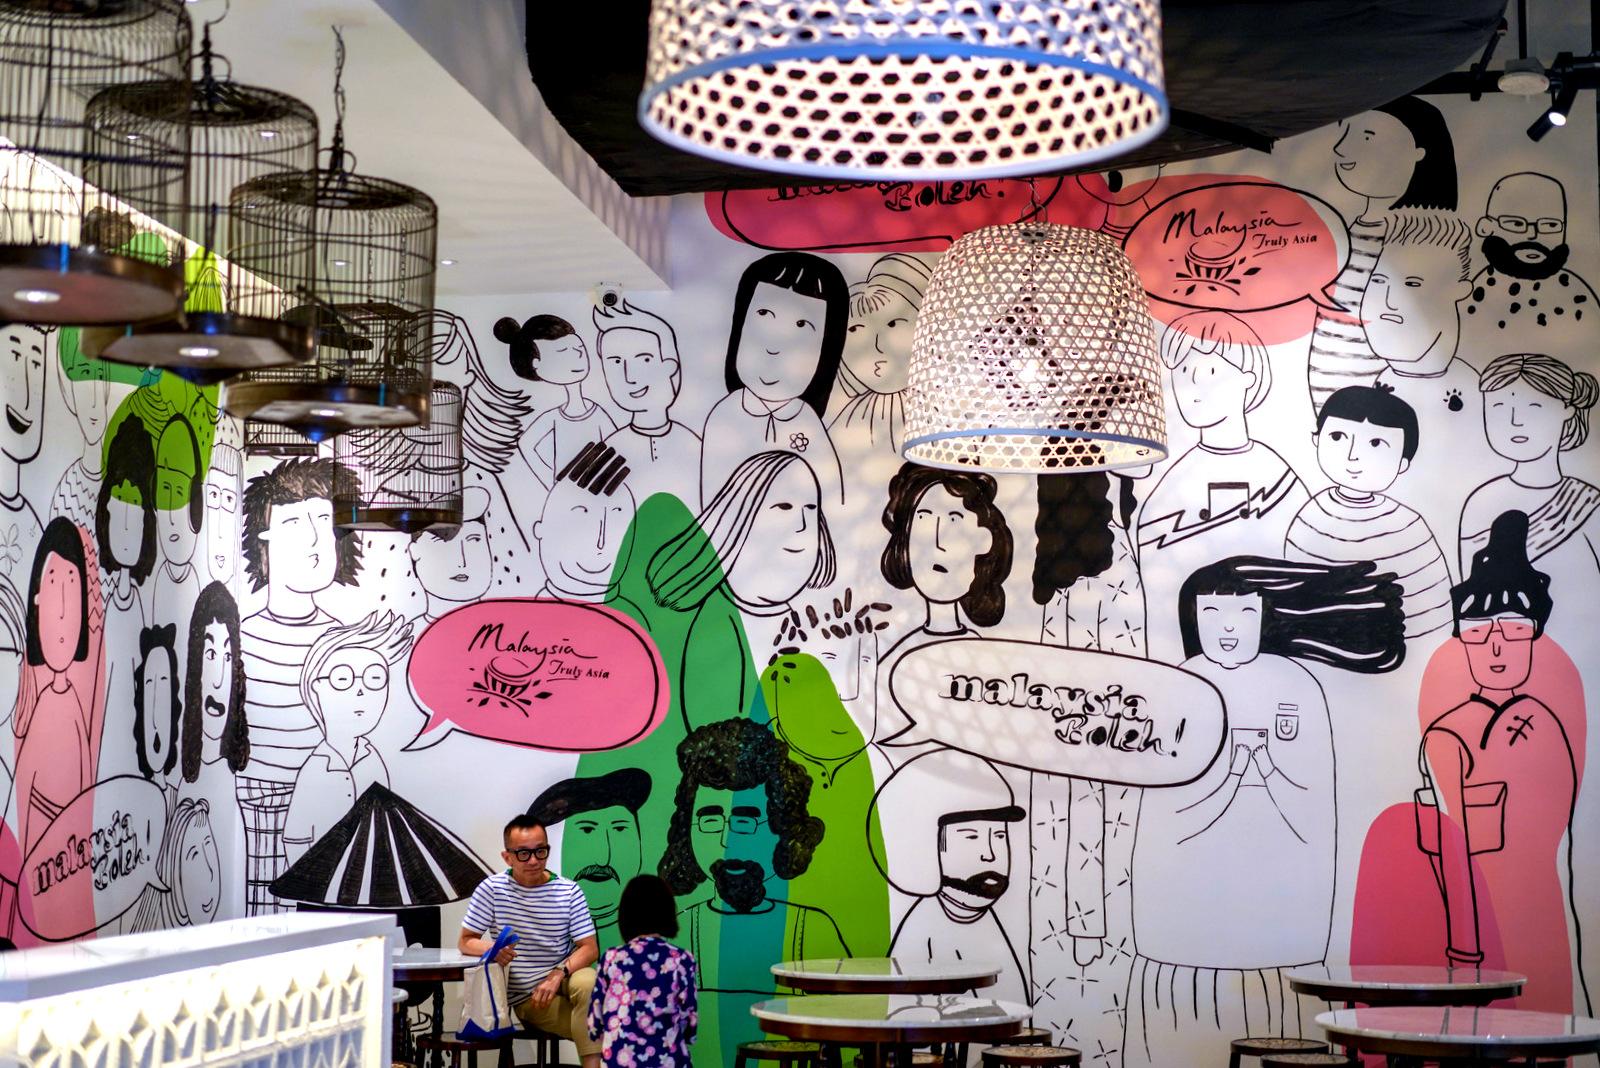 malaysia boleh @ shoppes at four seasons place